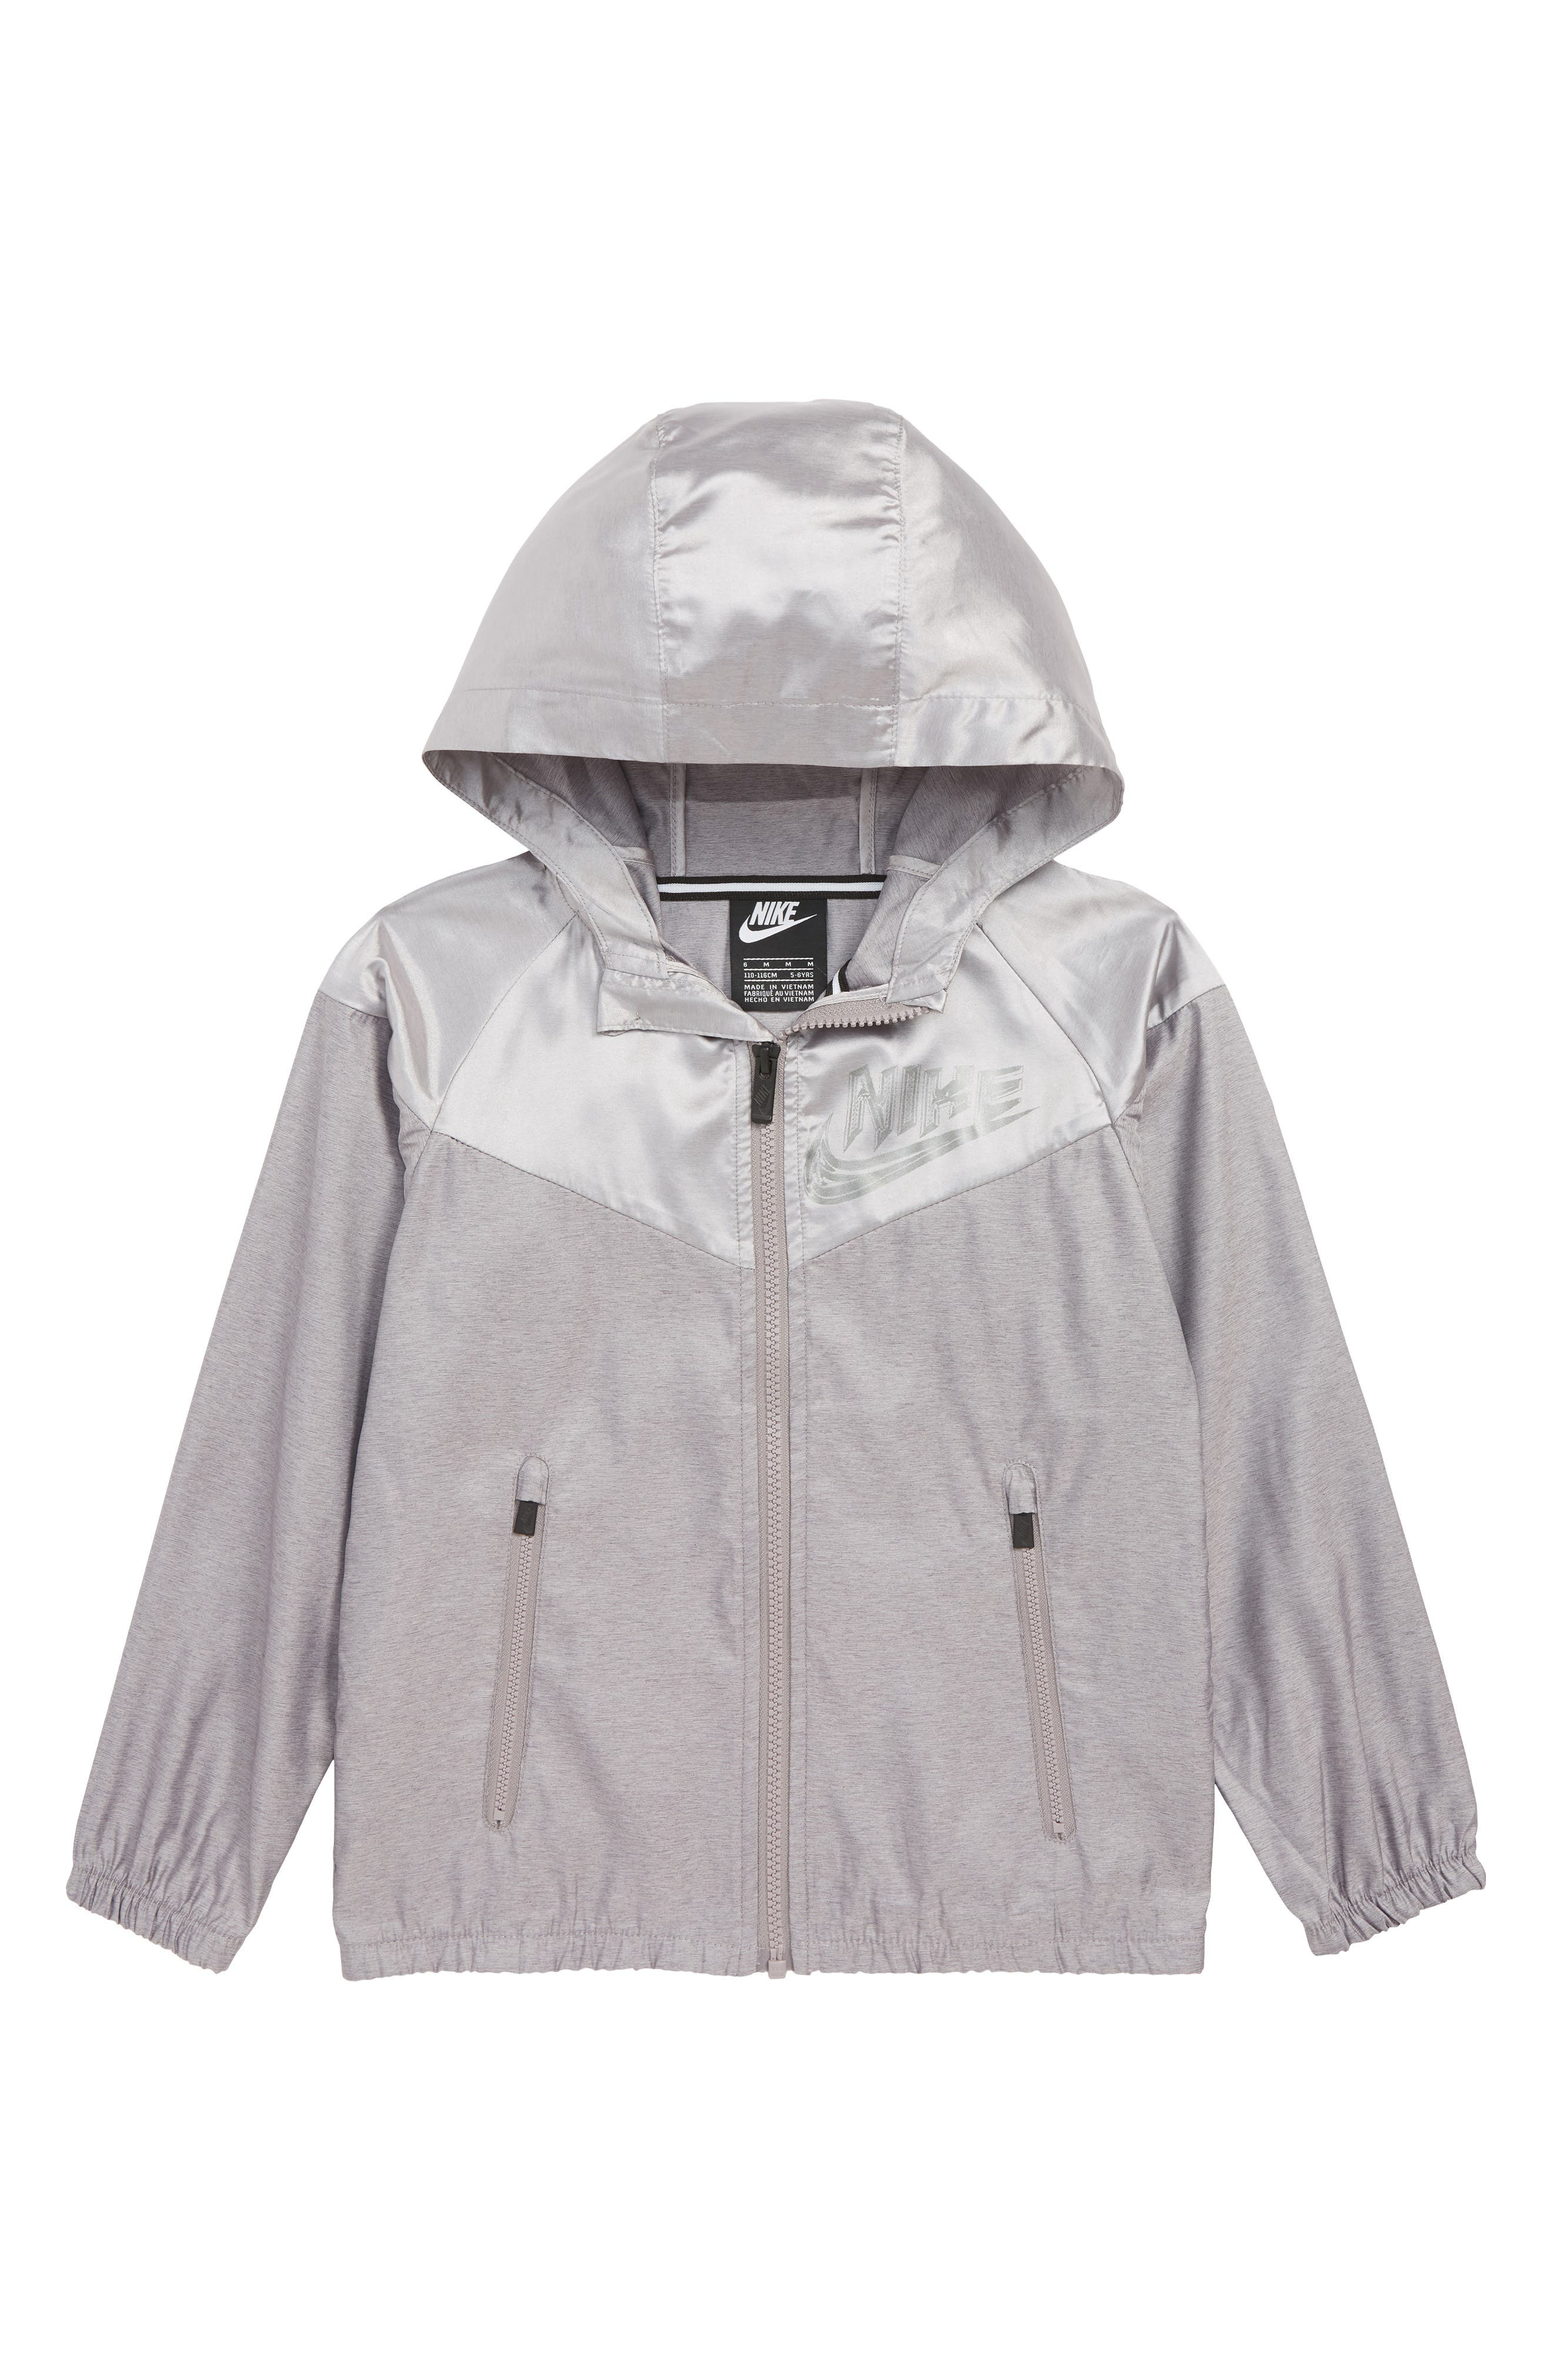 NIKE Sportswear Windrunner Jacket, Main, color, GUNSMOKE